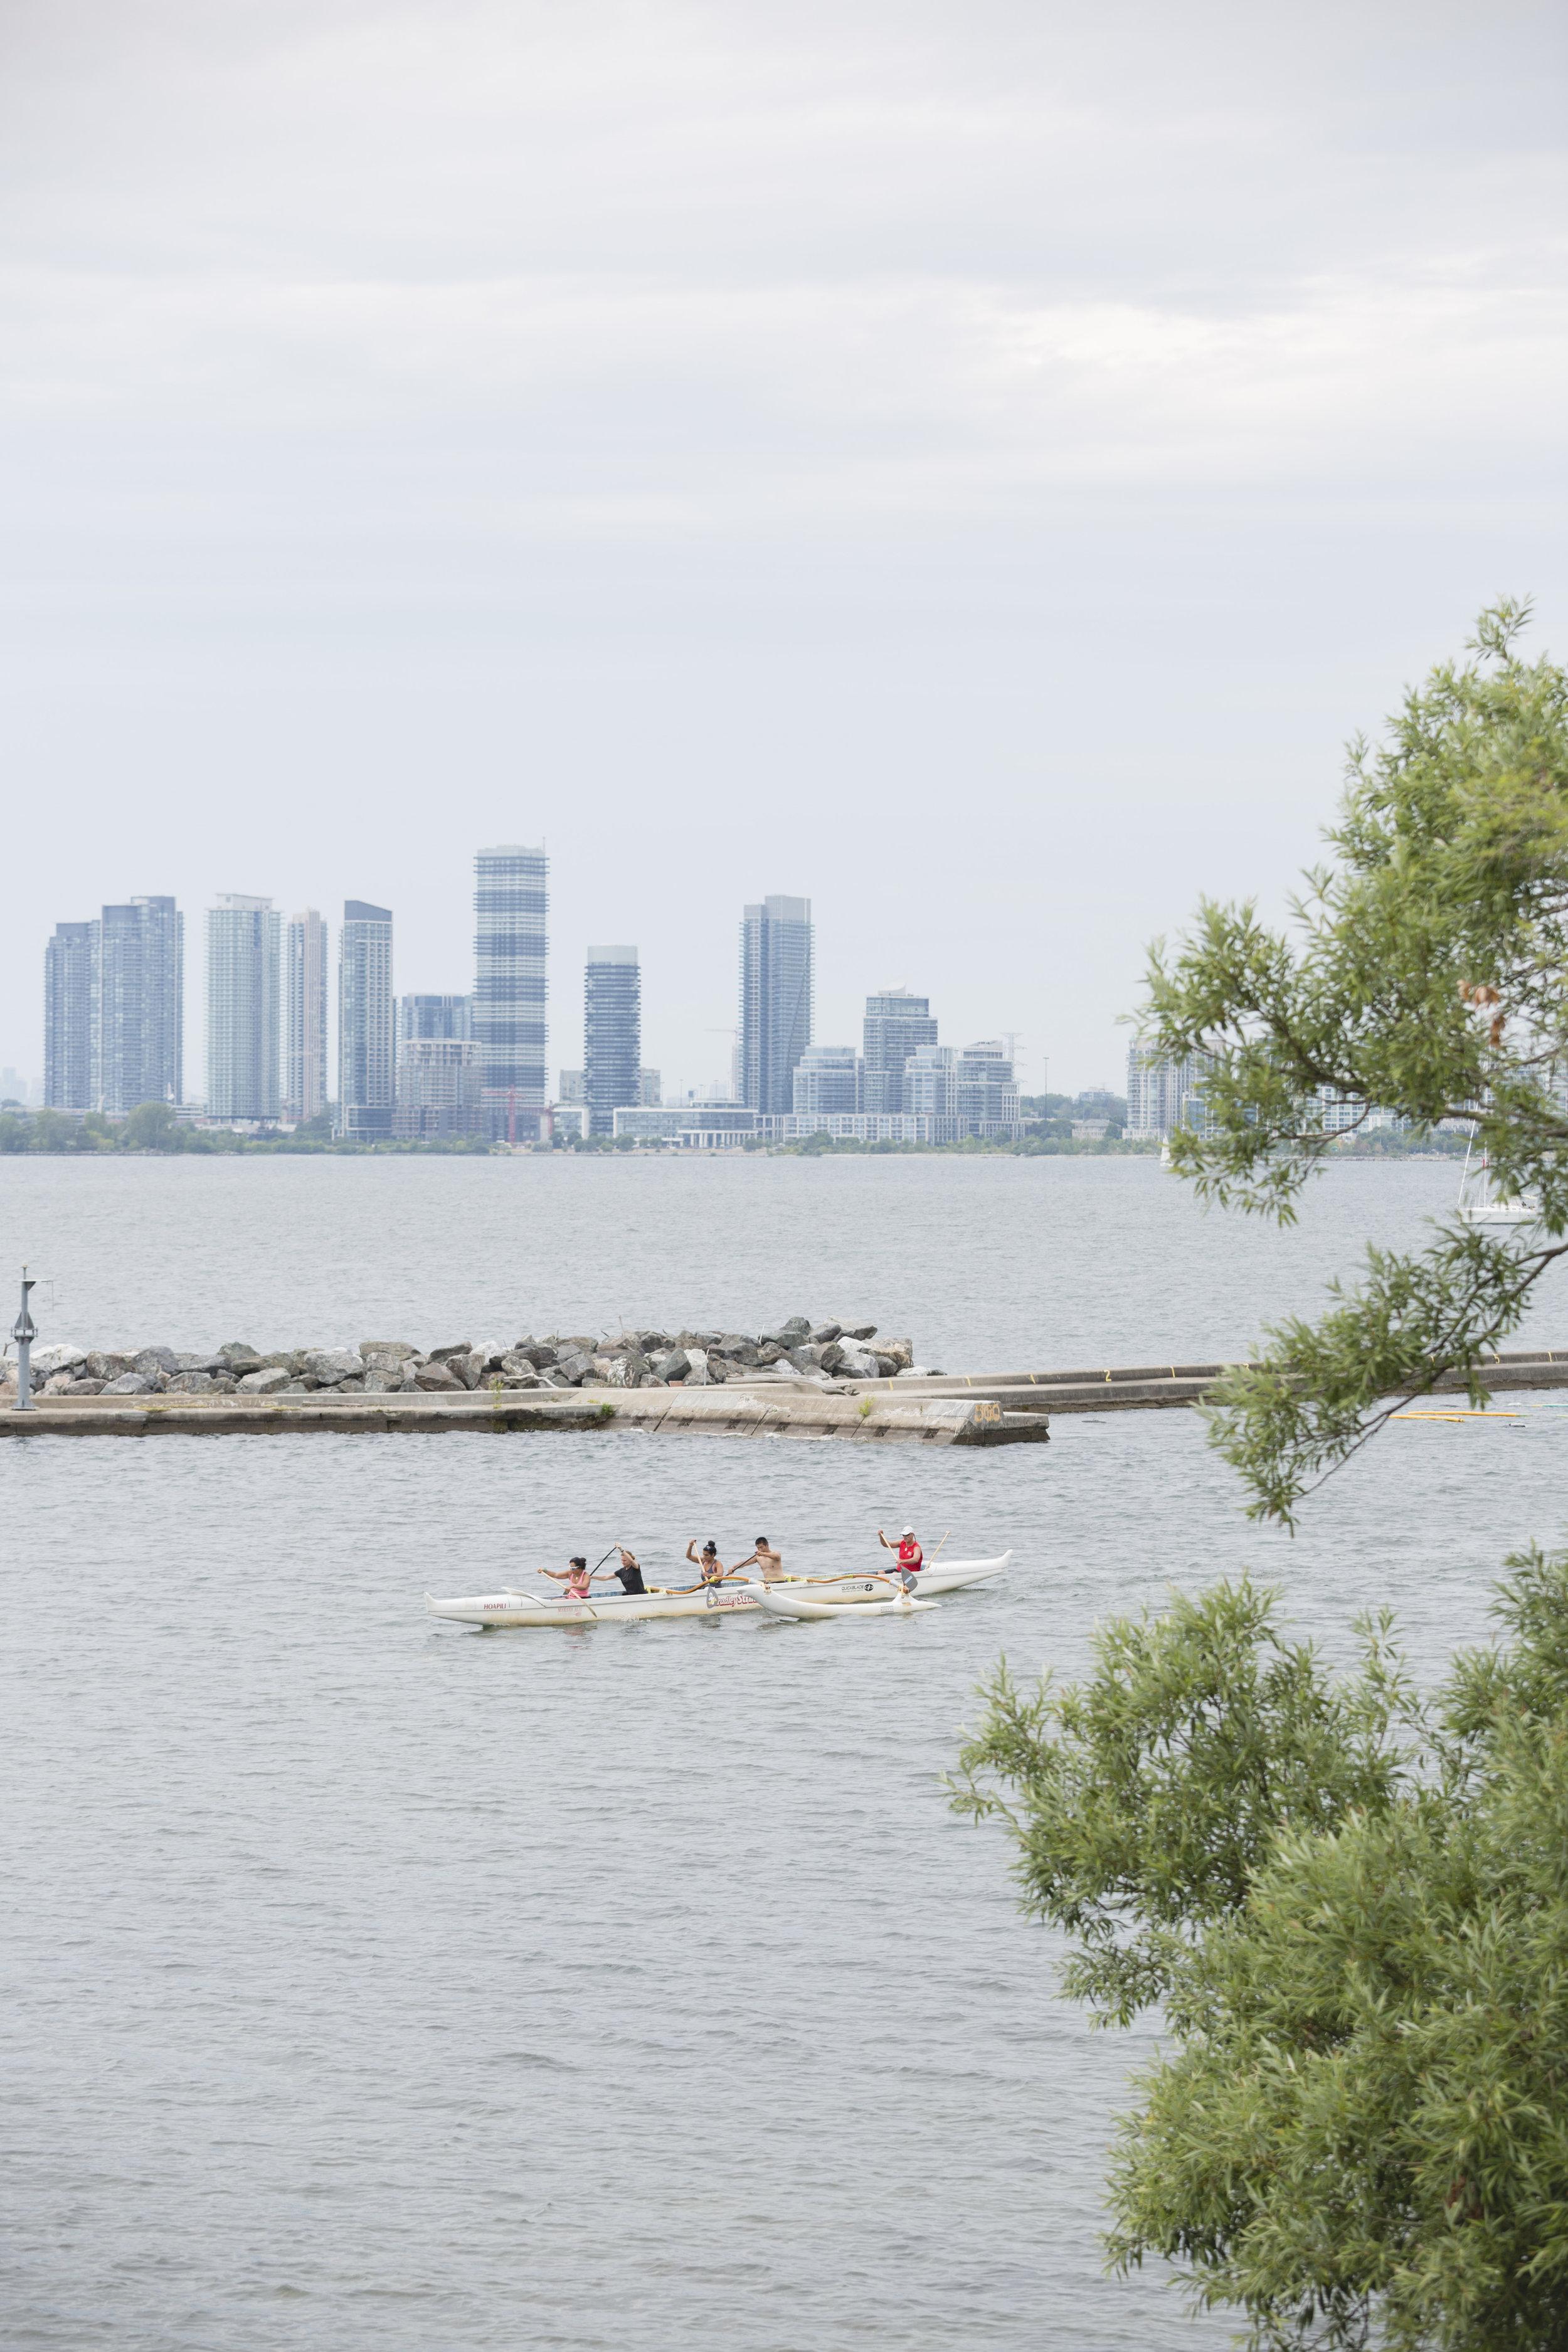 Rowing by the Toronto Argonaut Rowing Club